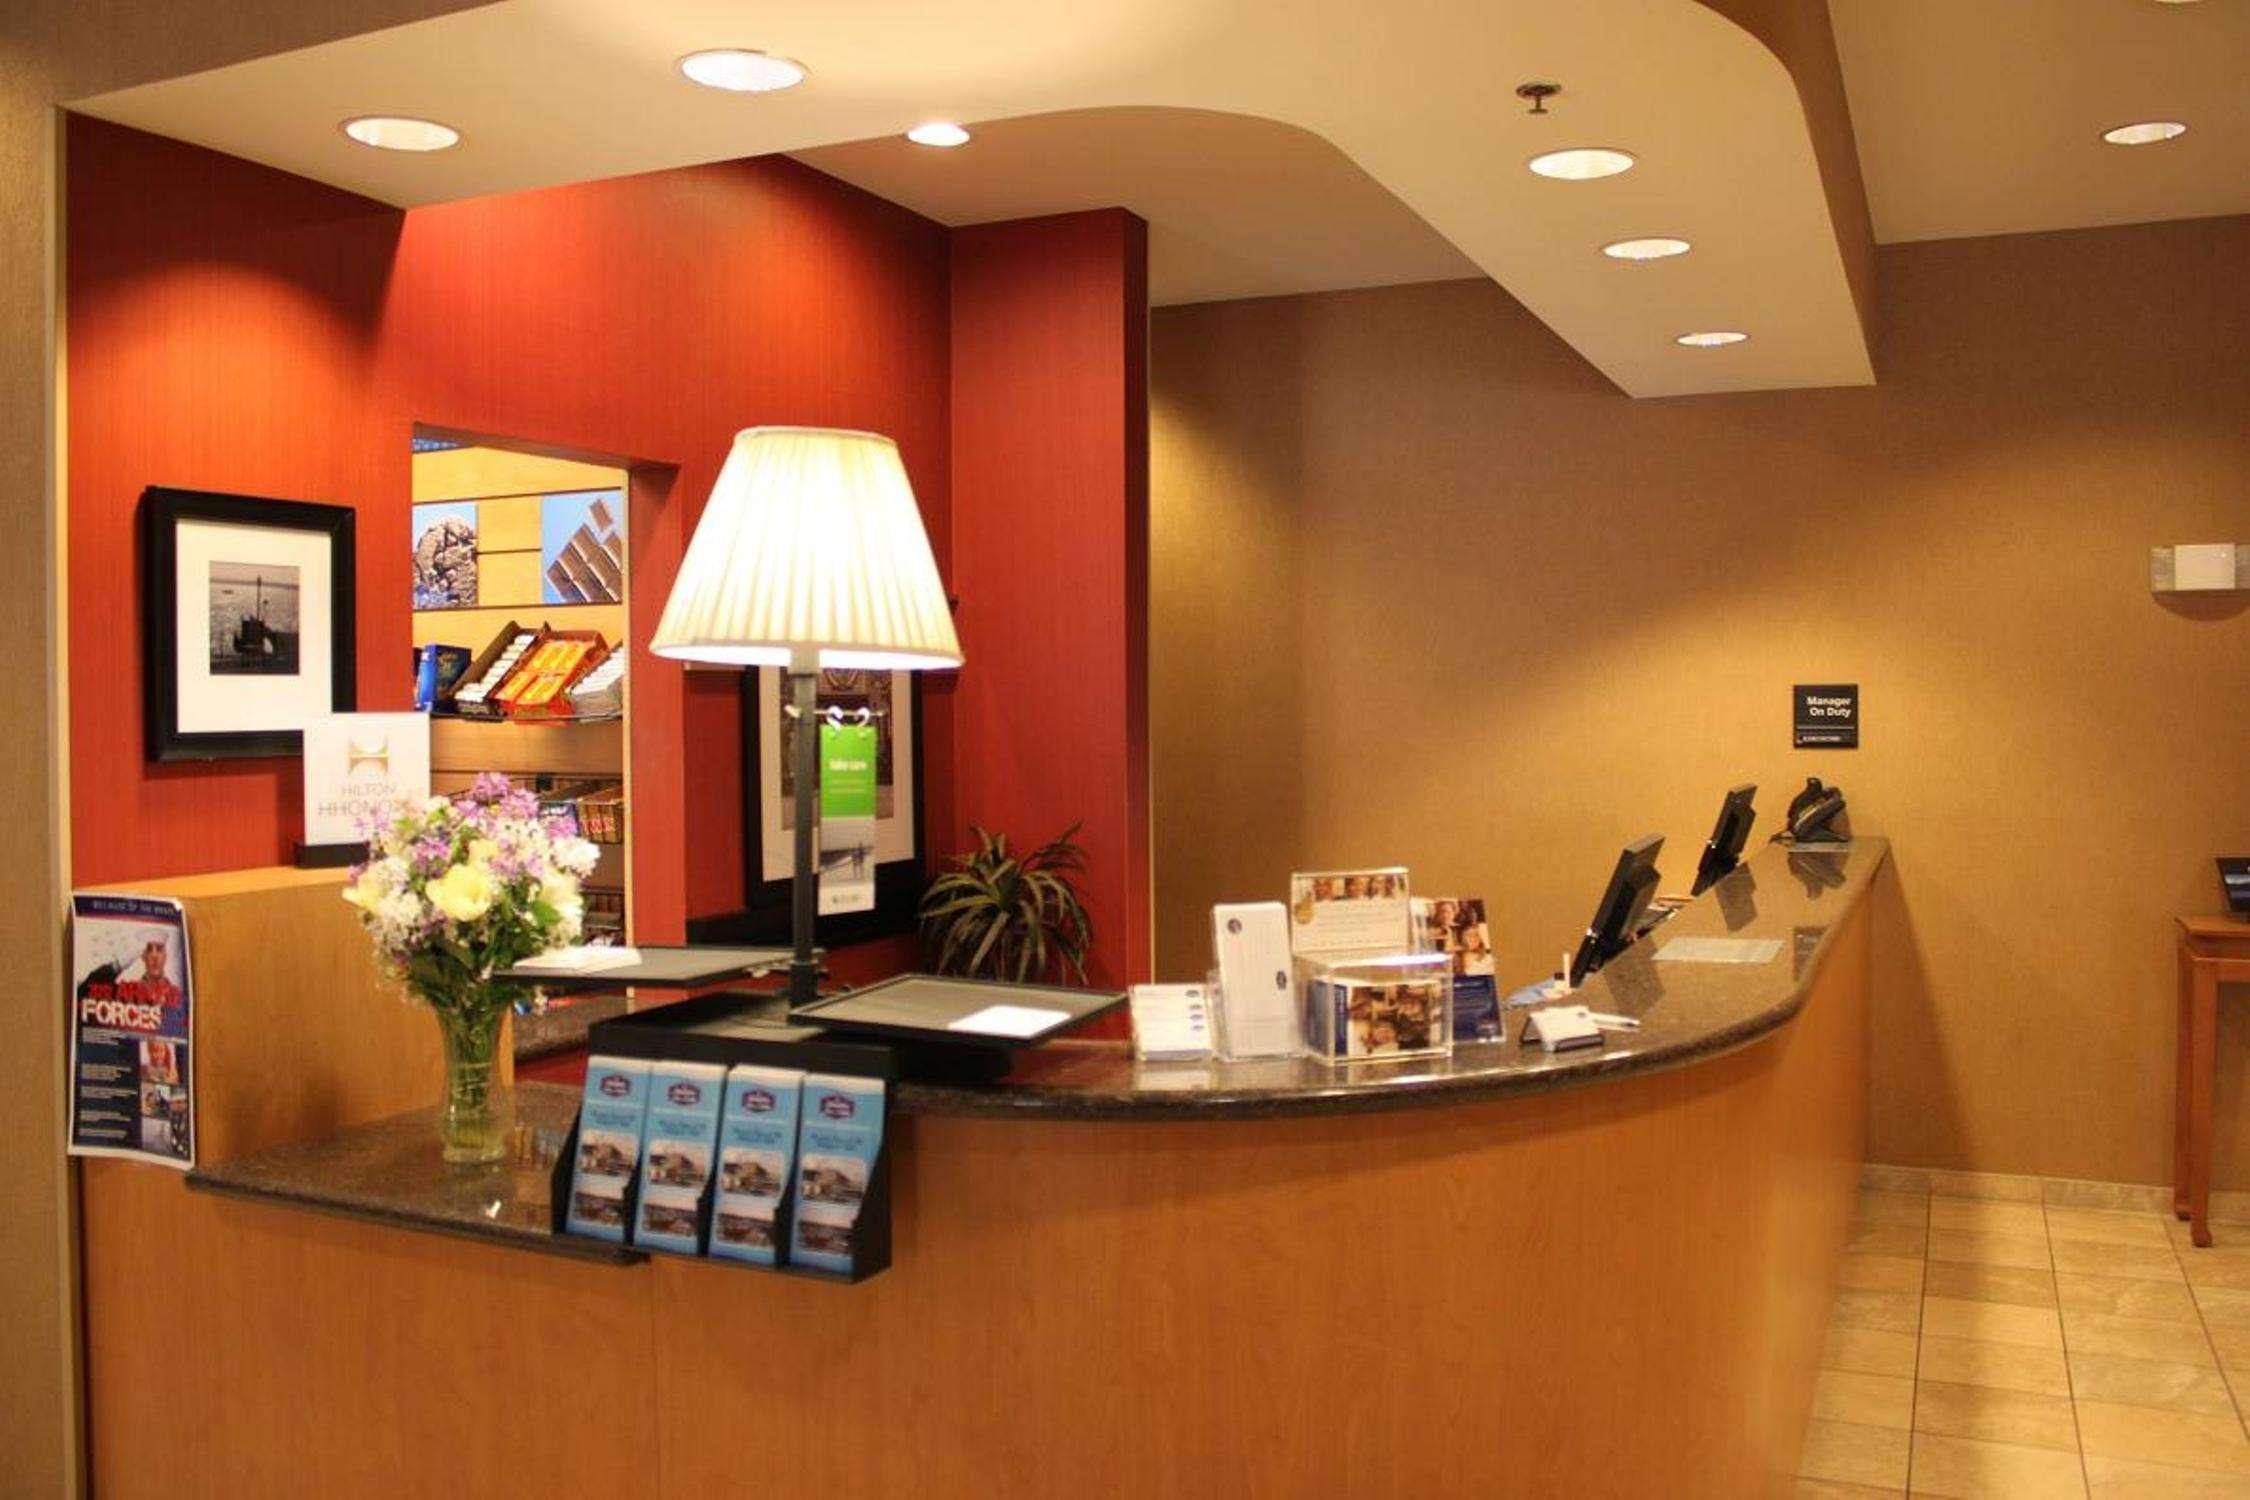 Hampton Inn & Suites Bremerton image 9